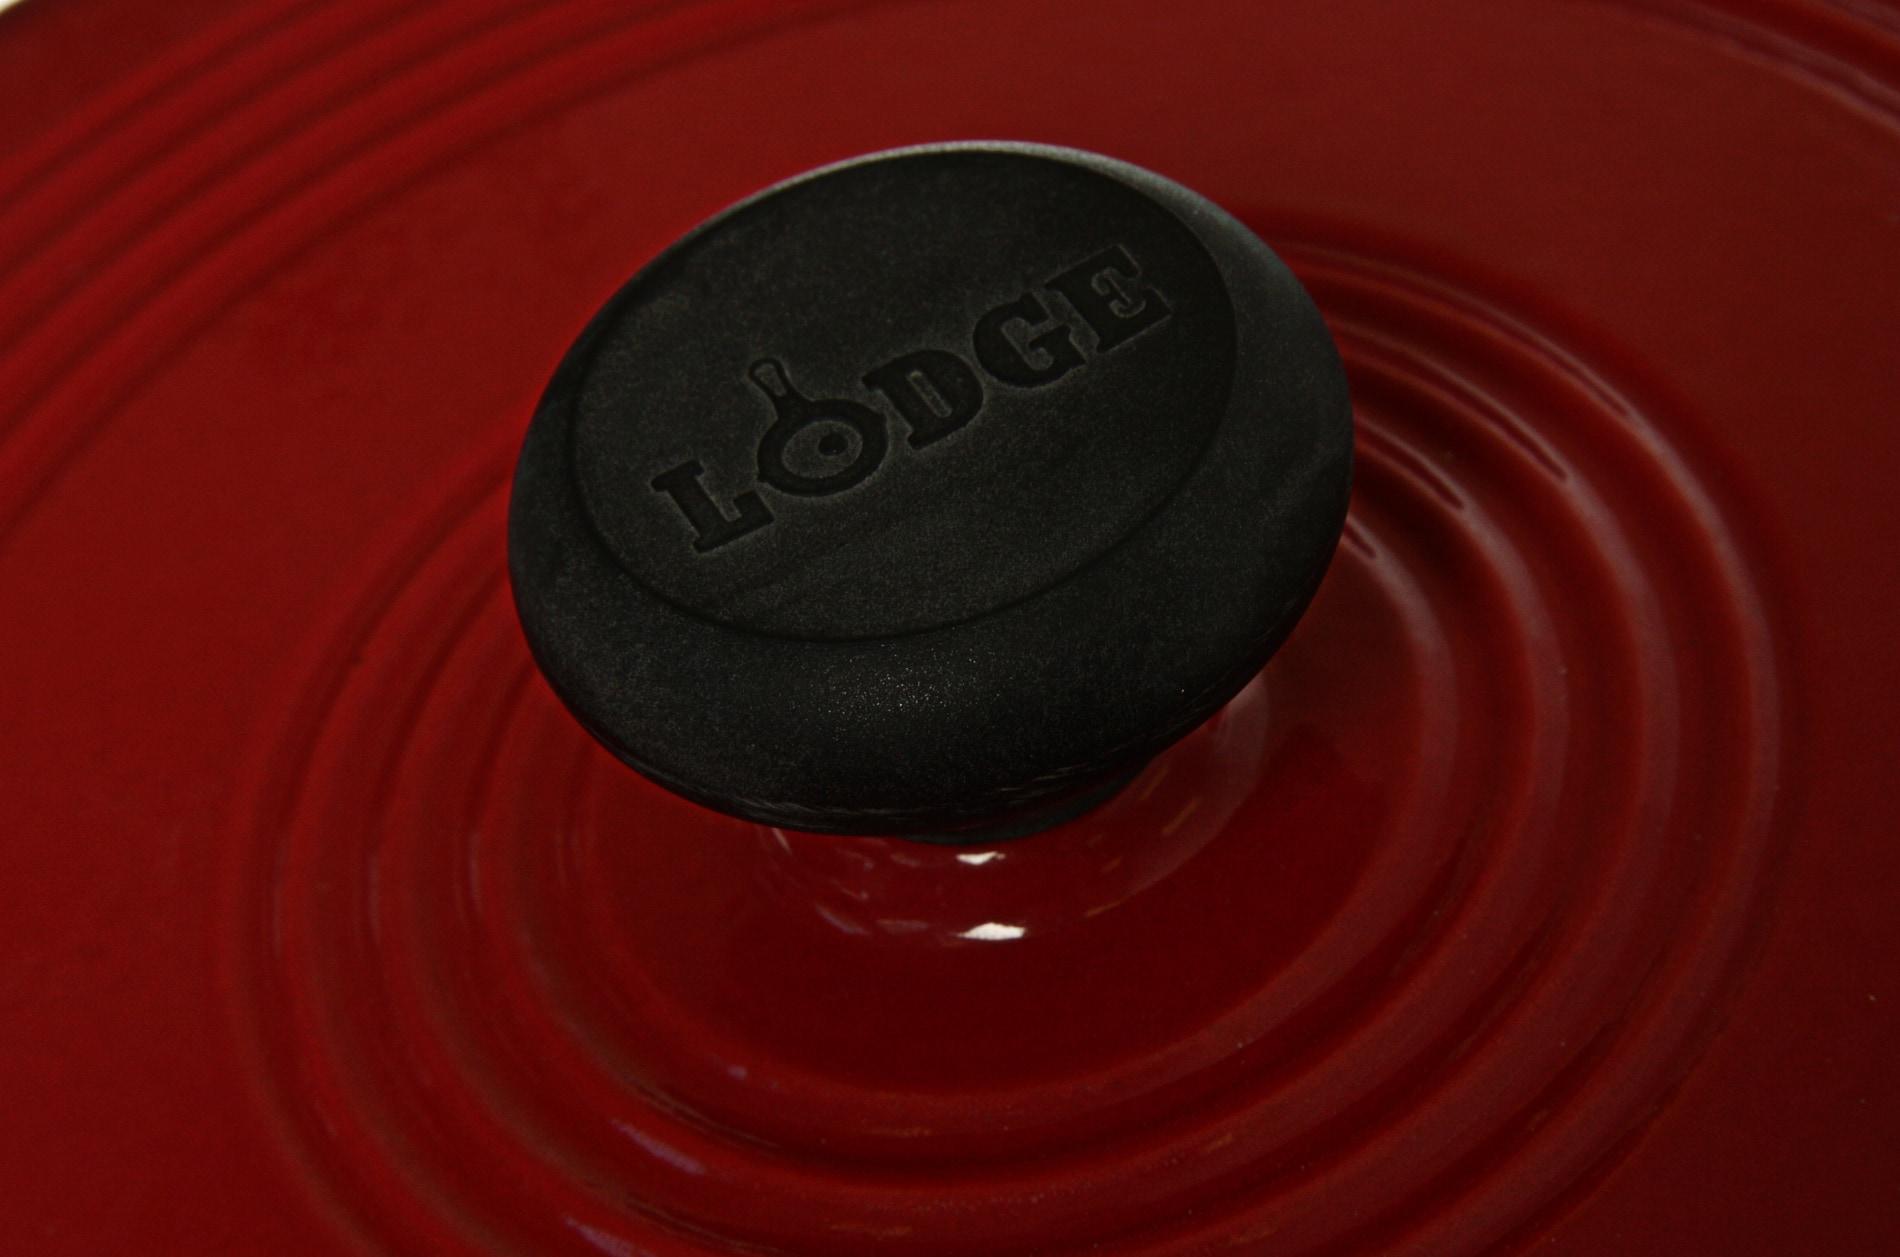 Lodge Red Enamel 3-quart Dutch Oven